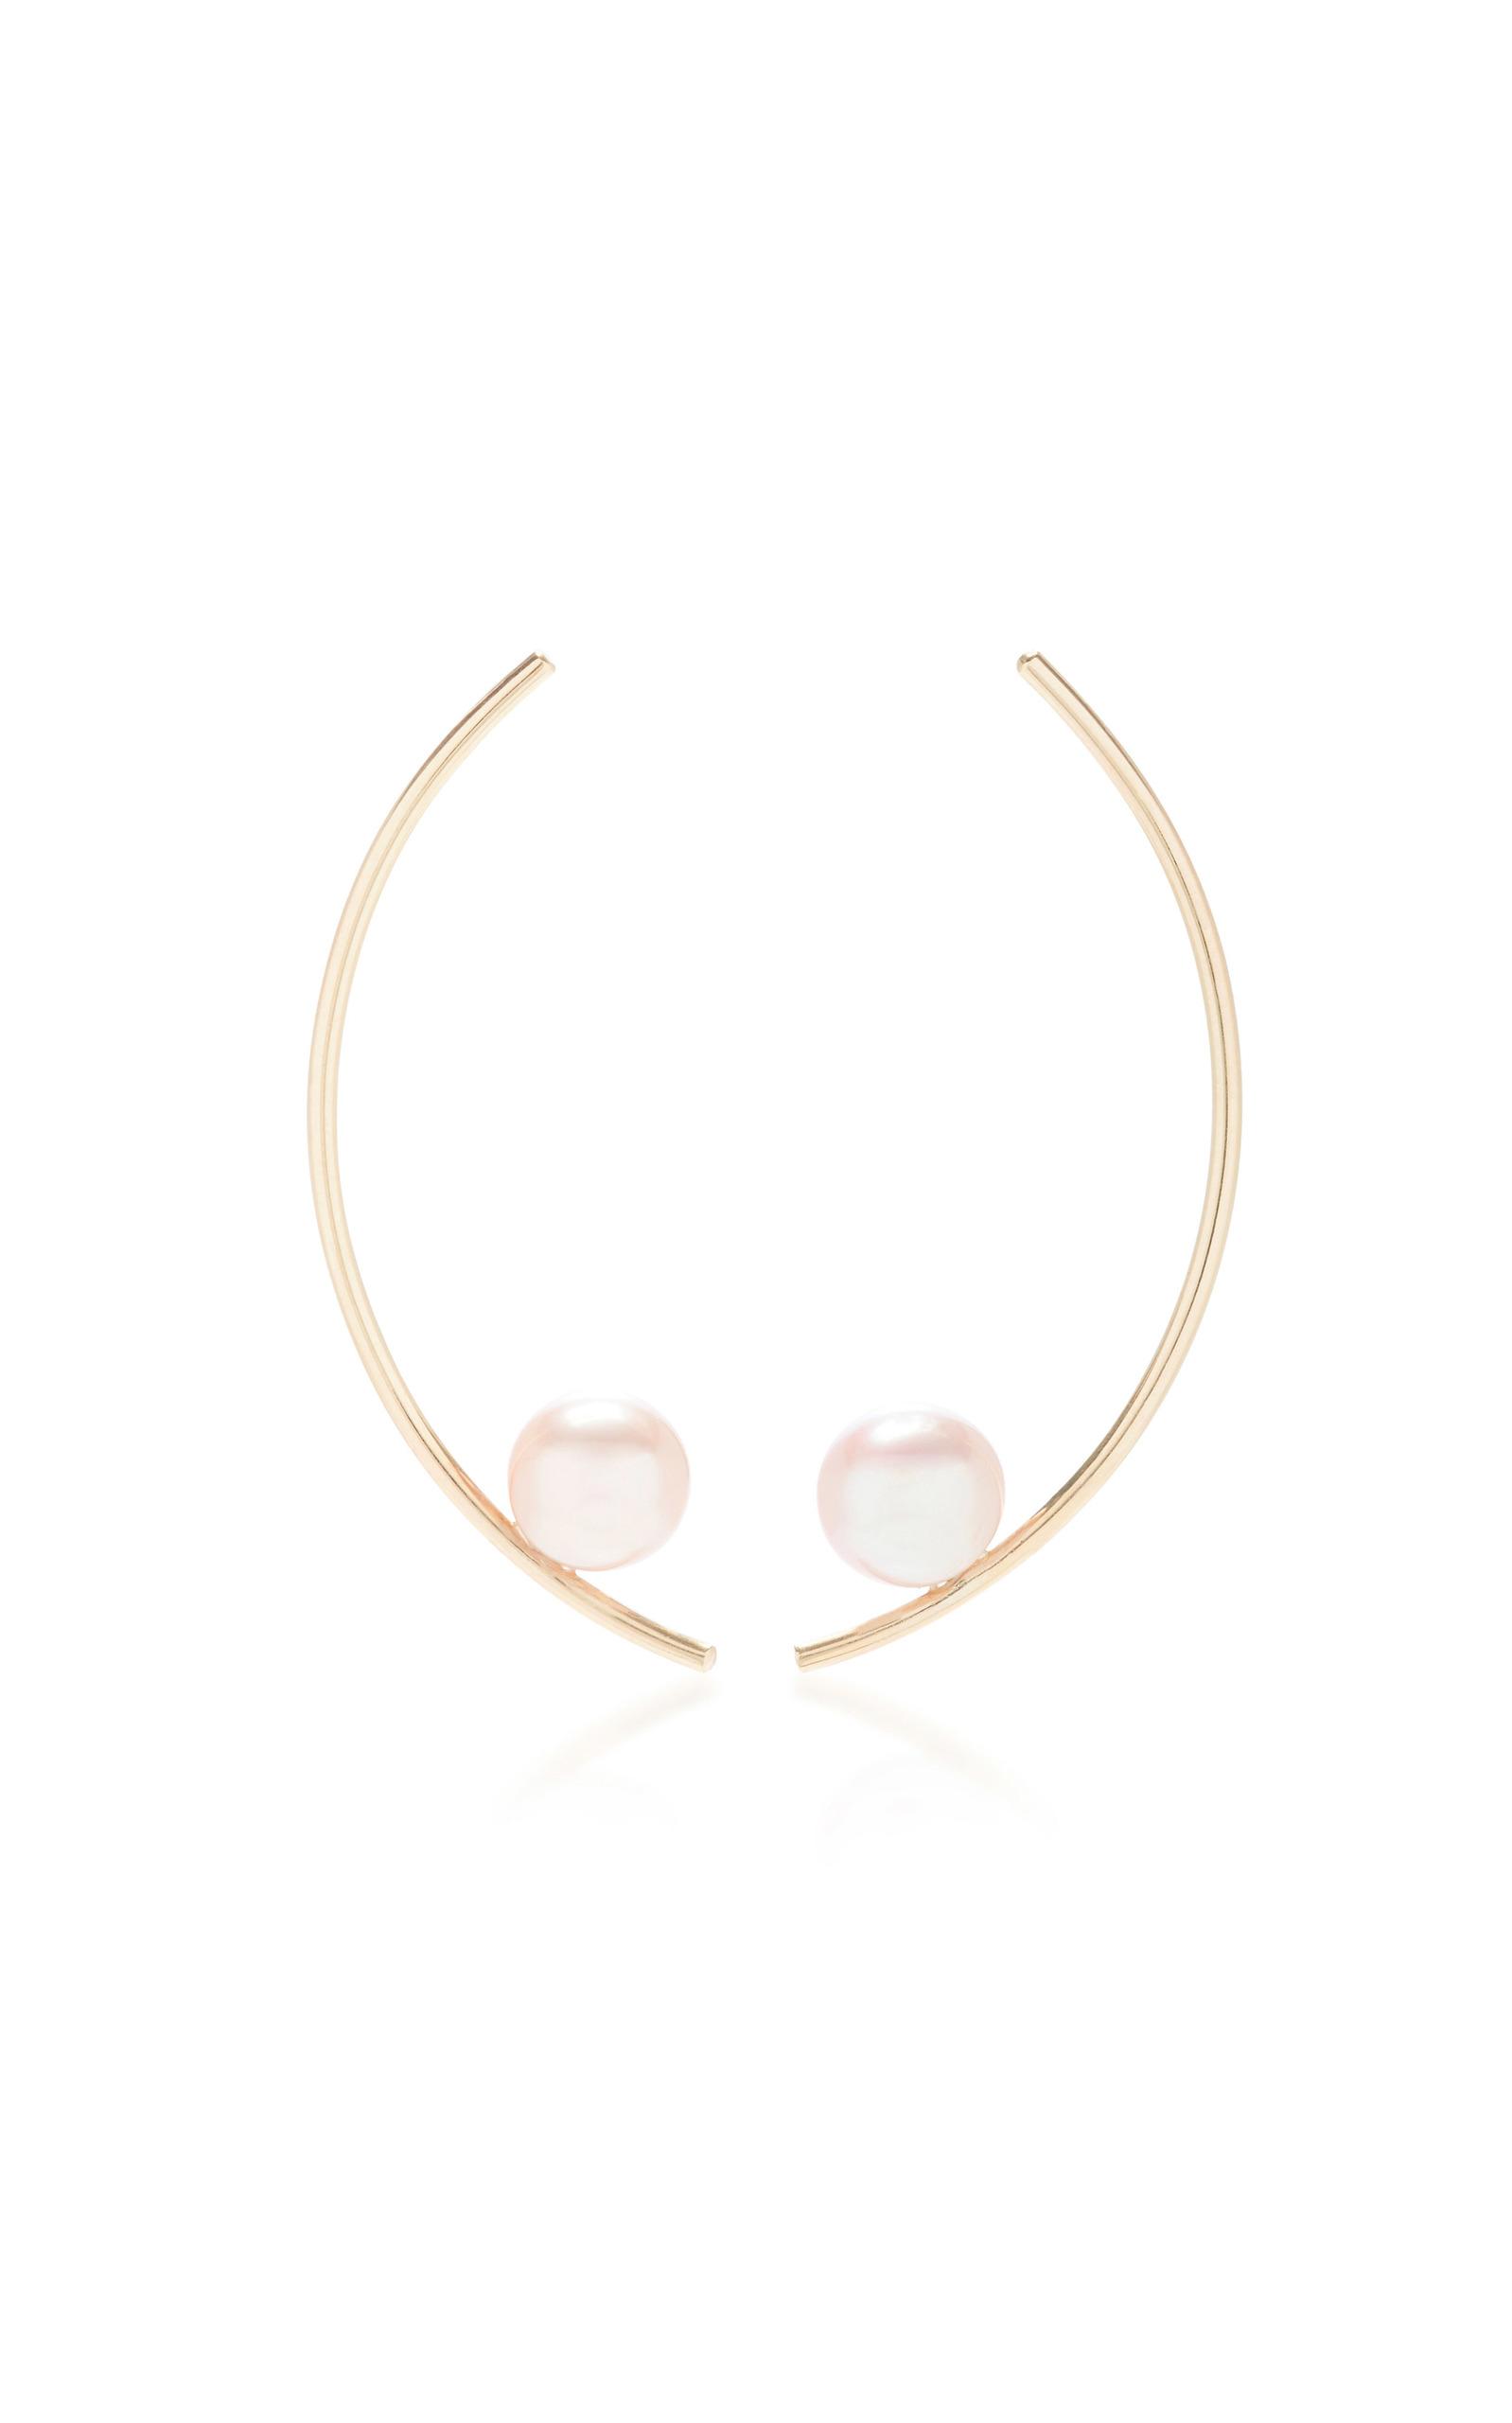 14K Gold Earring White/Space nog3enwx8f